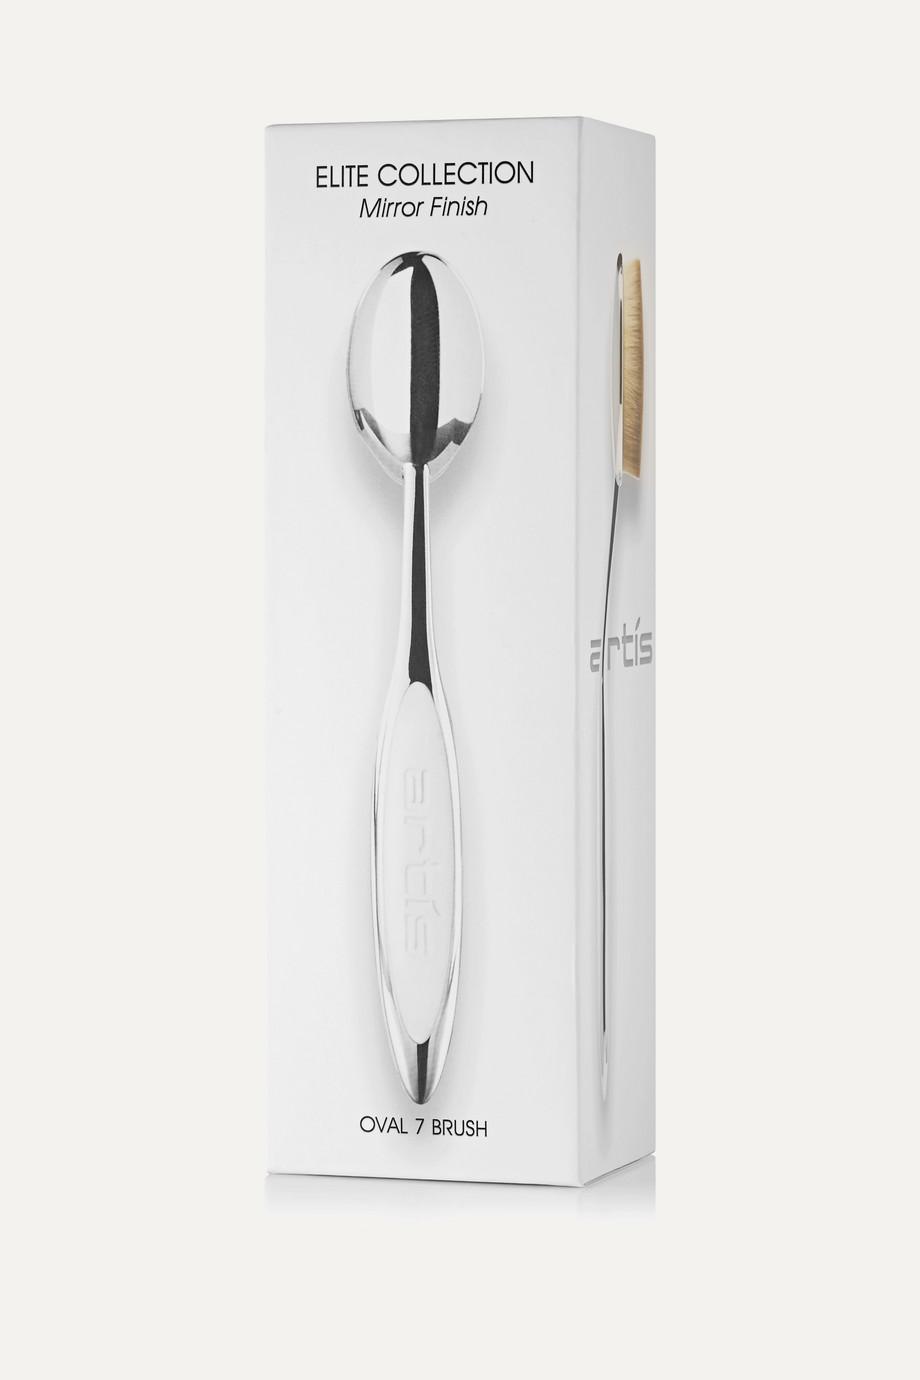 Artis Brush Next Generation Elite Mirror Oval 7 Brush